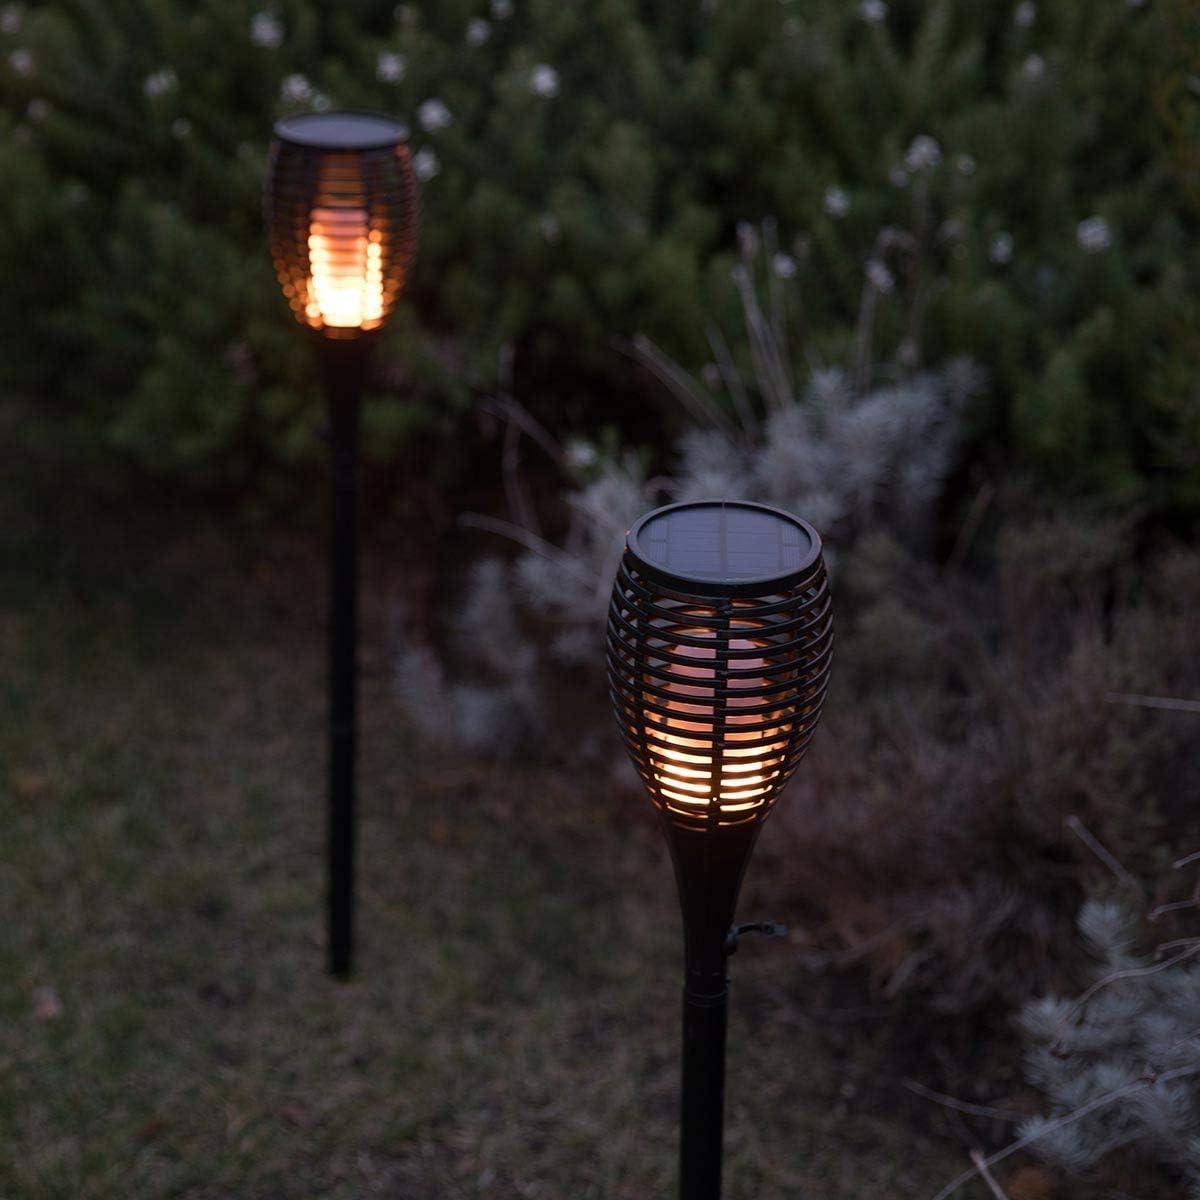 POWERPLUS Kiwi Energie Solaire EFFET FLAMME LUMIERE MURALE